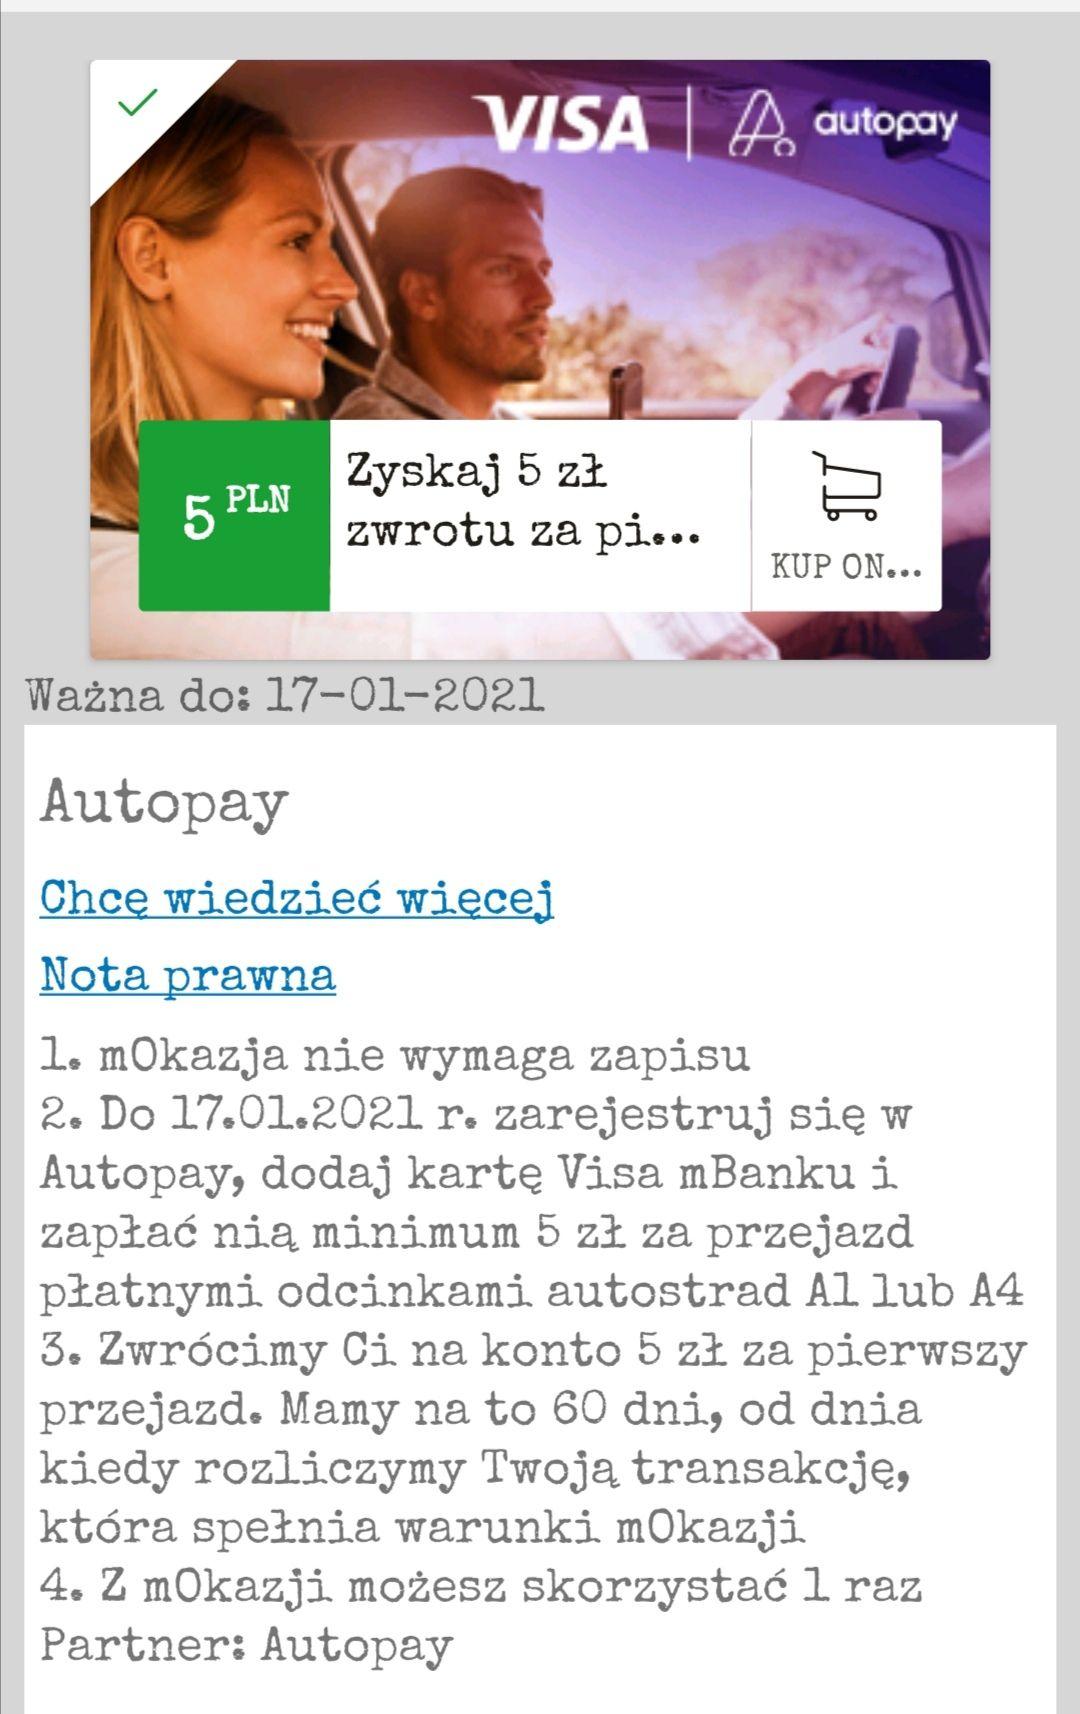 Autopay 5 PLN zwrotu z mOkazjami i Visa